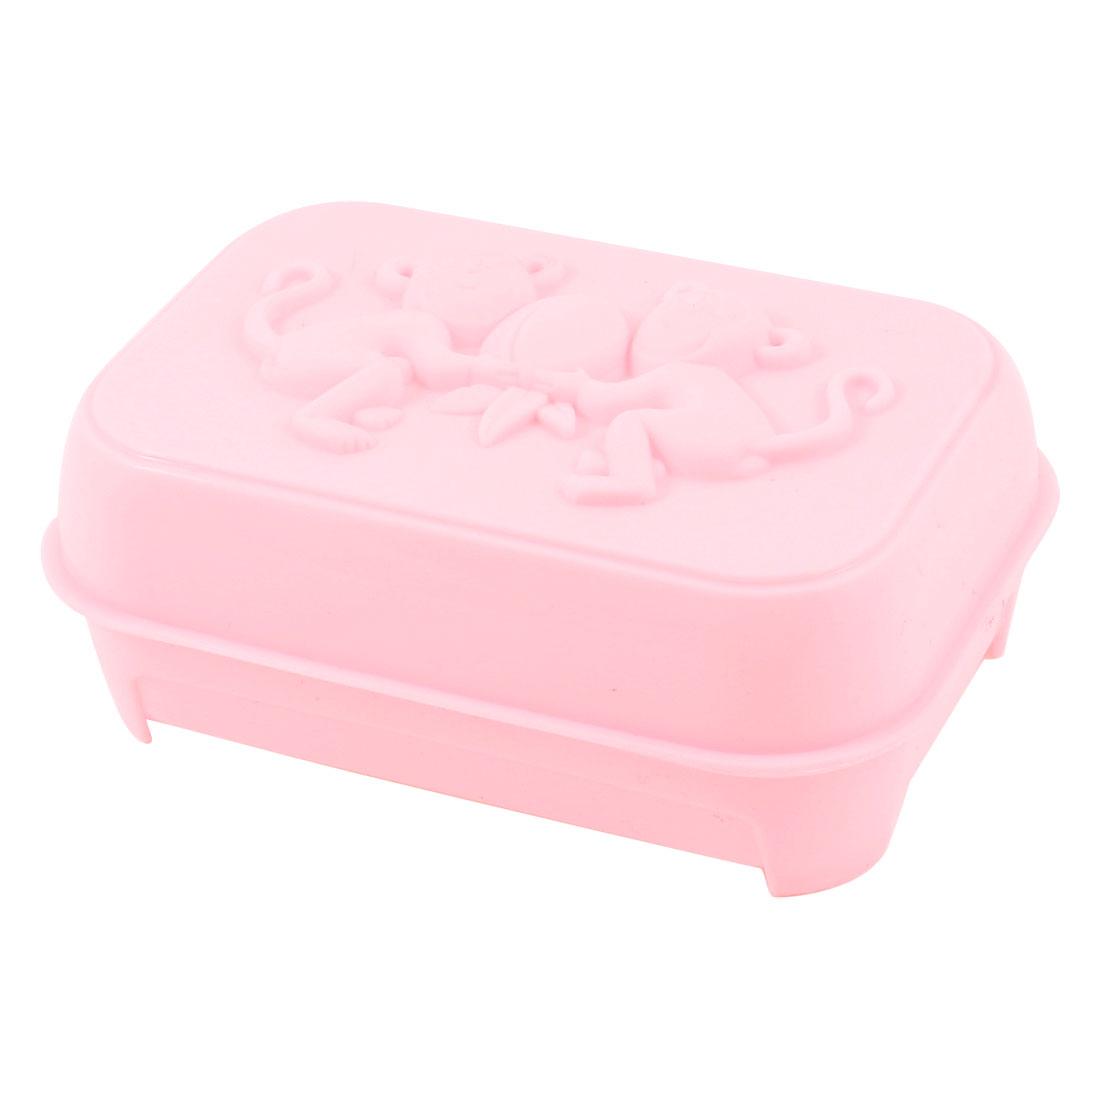 Embossed Monkey Design Rectangular Soap Dish Case Box Light Pink